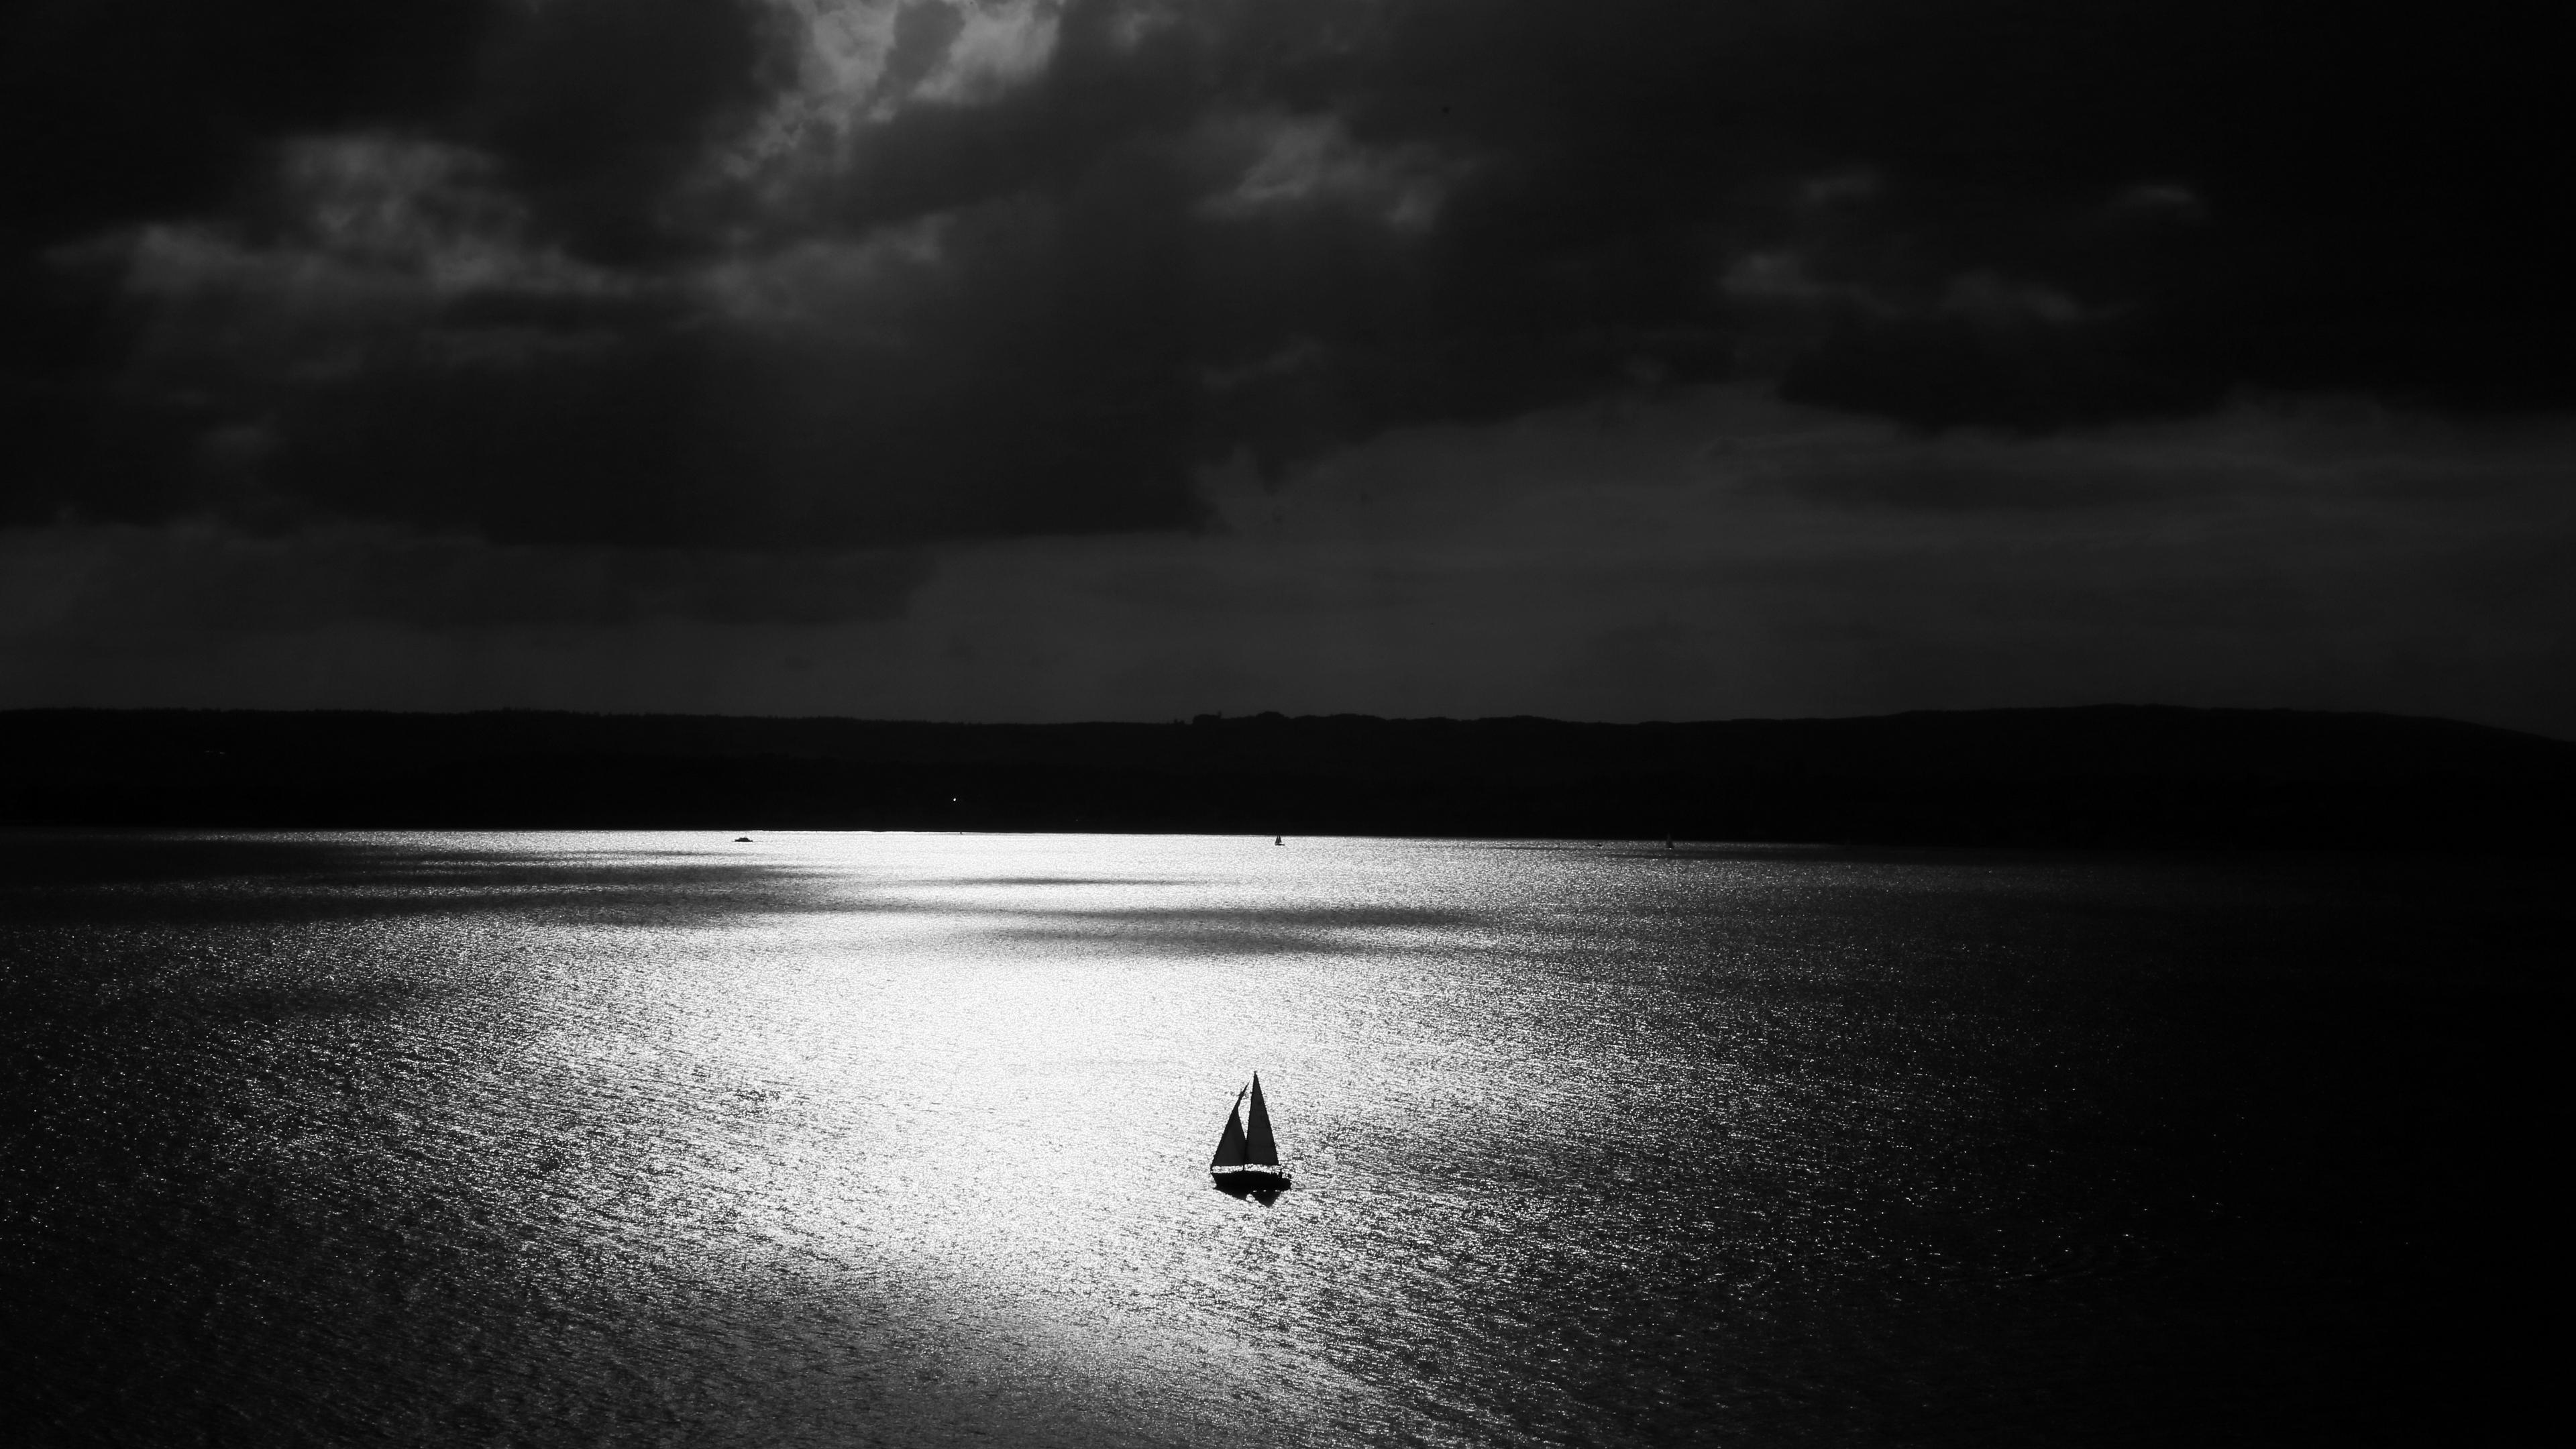 sail lonely night bw 4k 1540575147 - sail, lonely, night, bw 4k - Sail, Night, Lonely